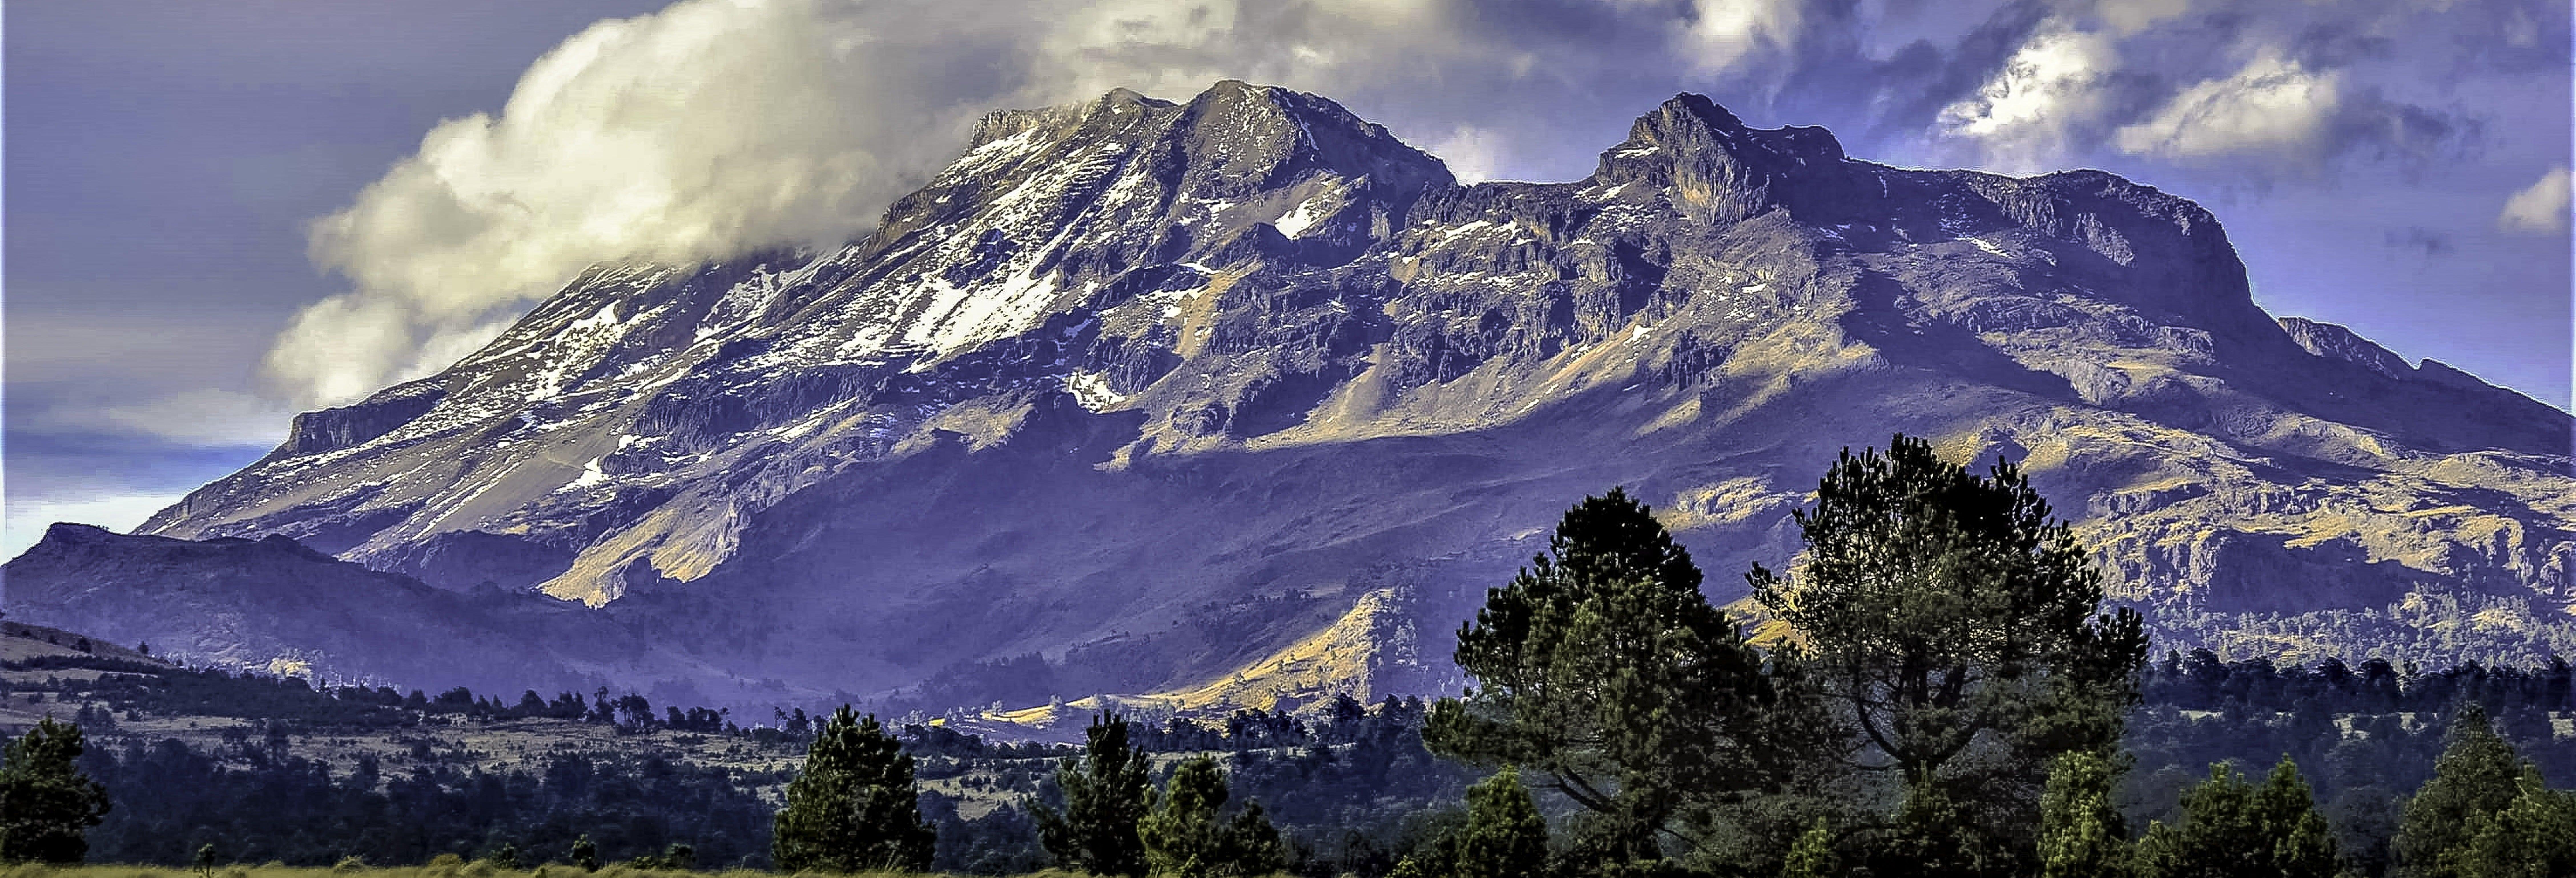 Excursion to the Popocatépetl and Iztaccíhuatl Volcanoes